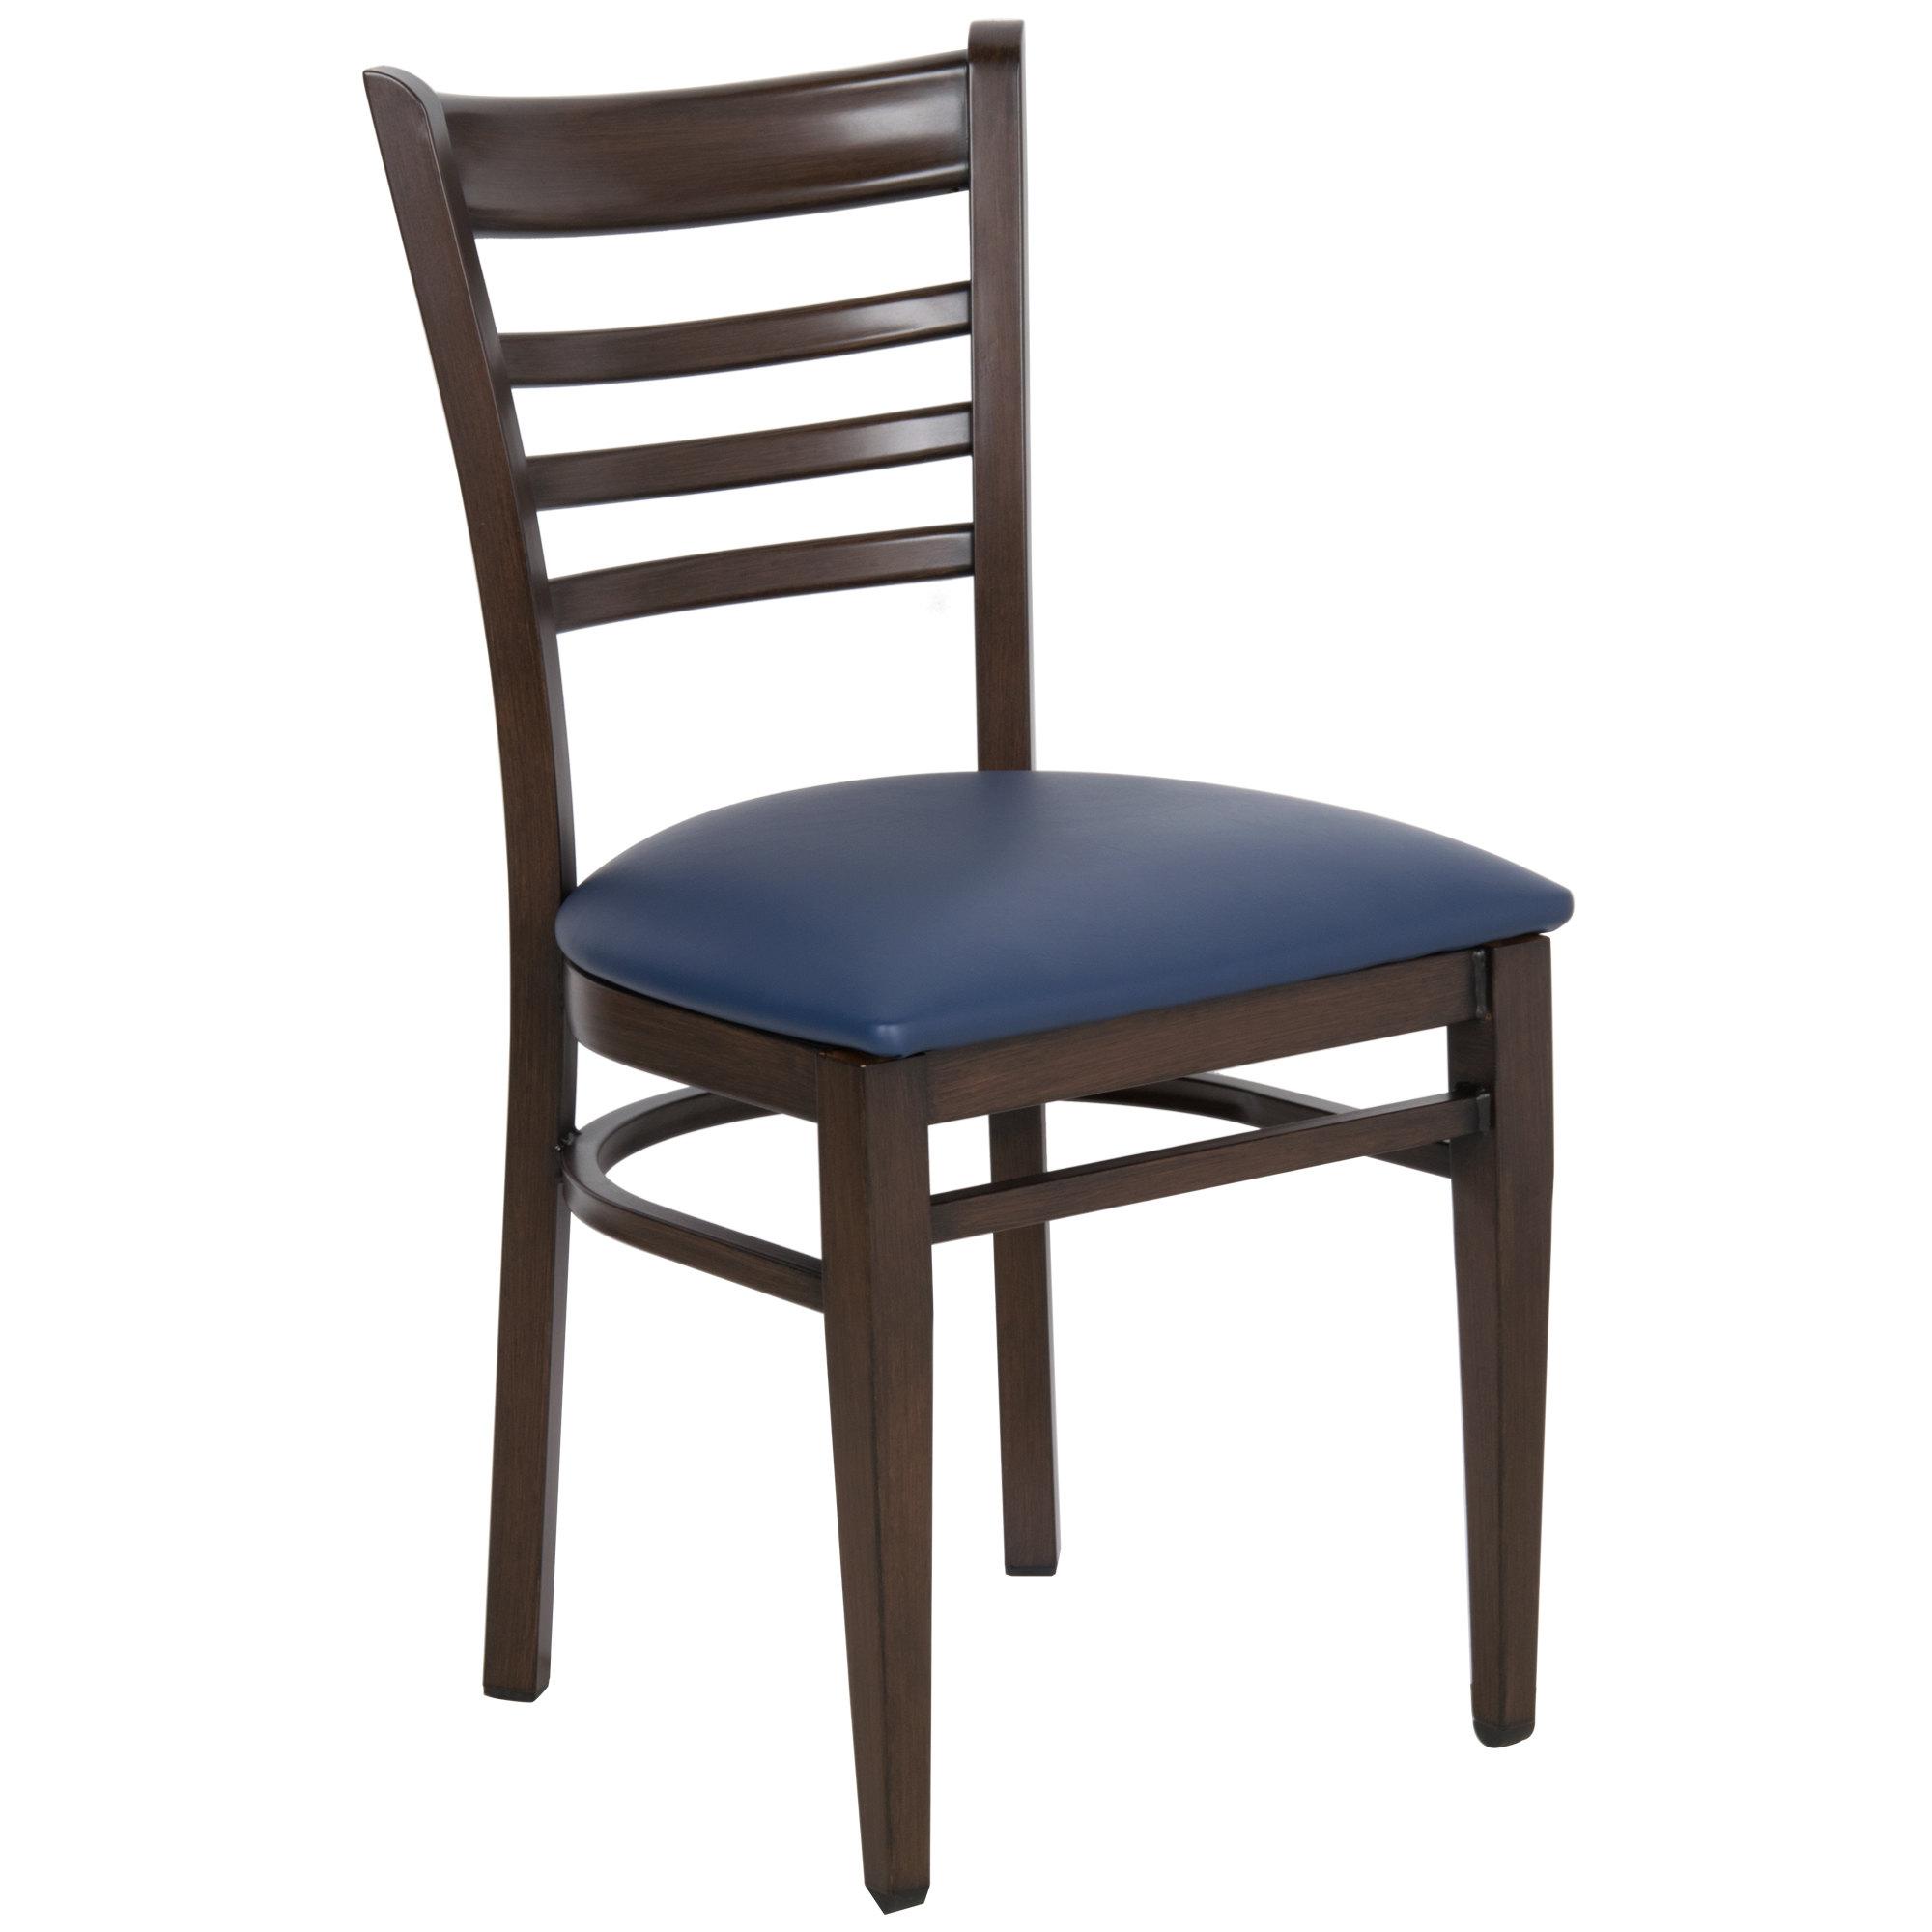 #144 - Ladder Back Design Metal Restaurant Chair with Walnut Wood Grain Finish and Navy Vinyl Seat